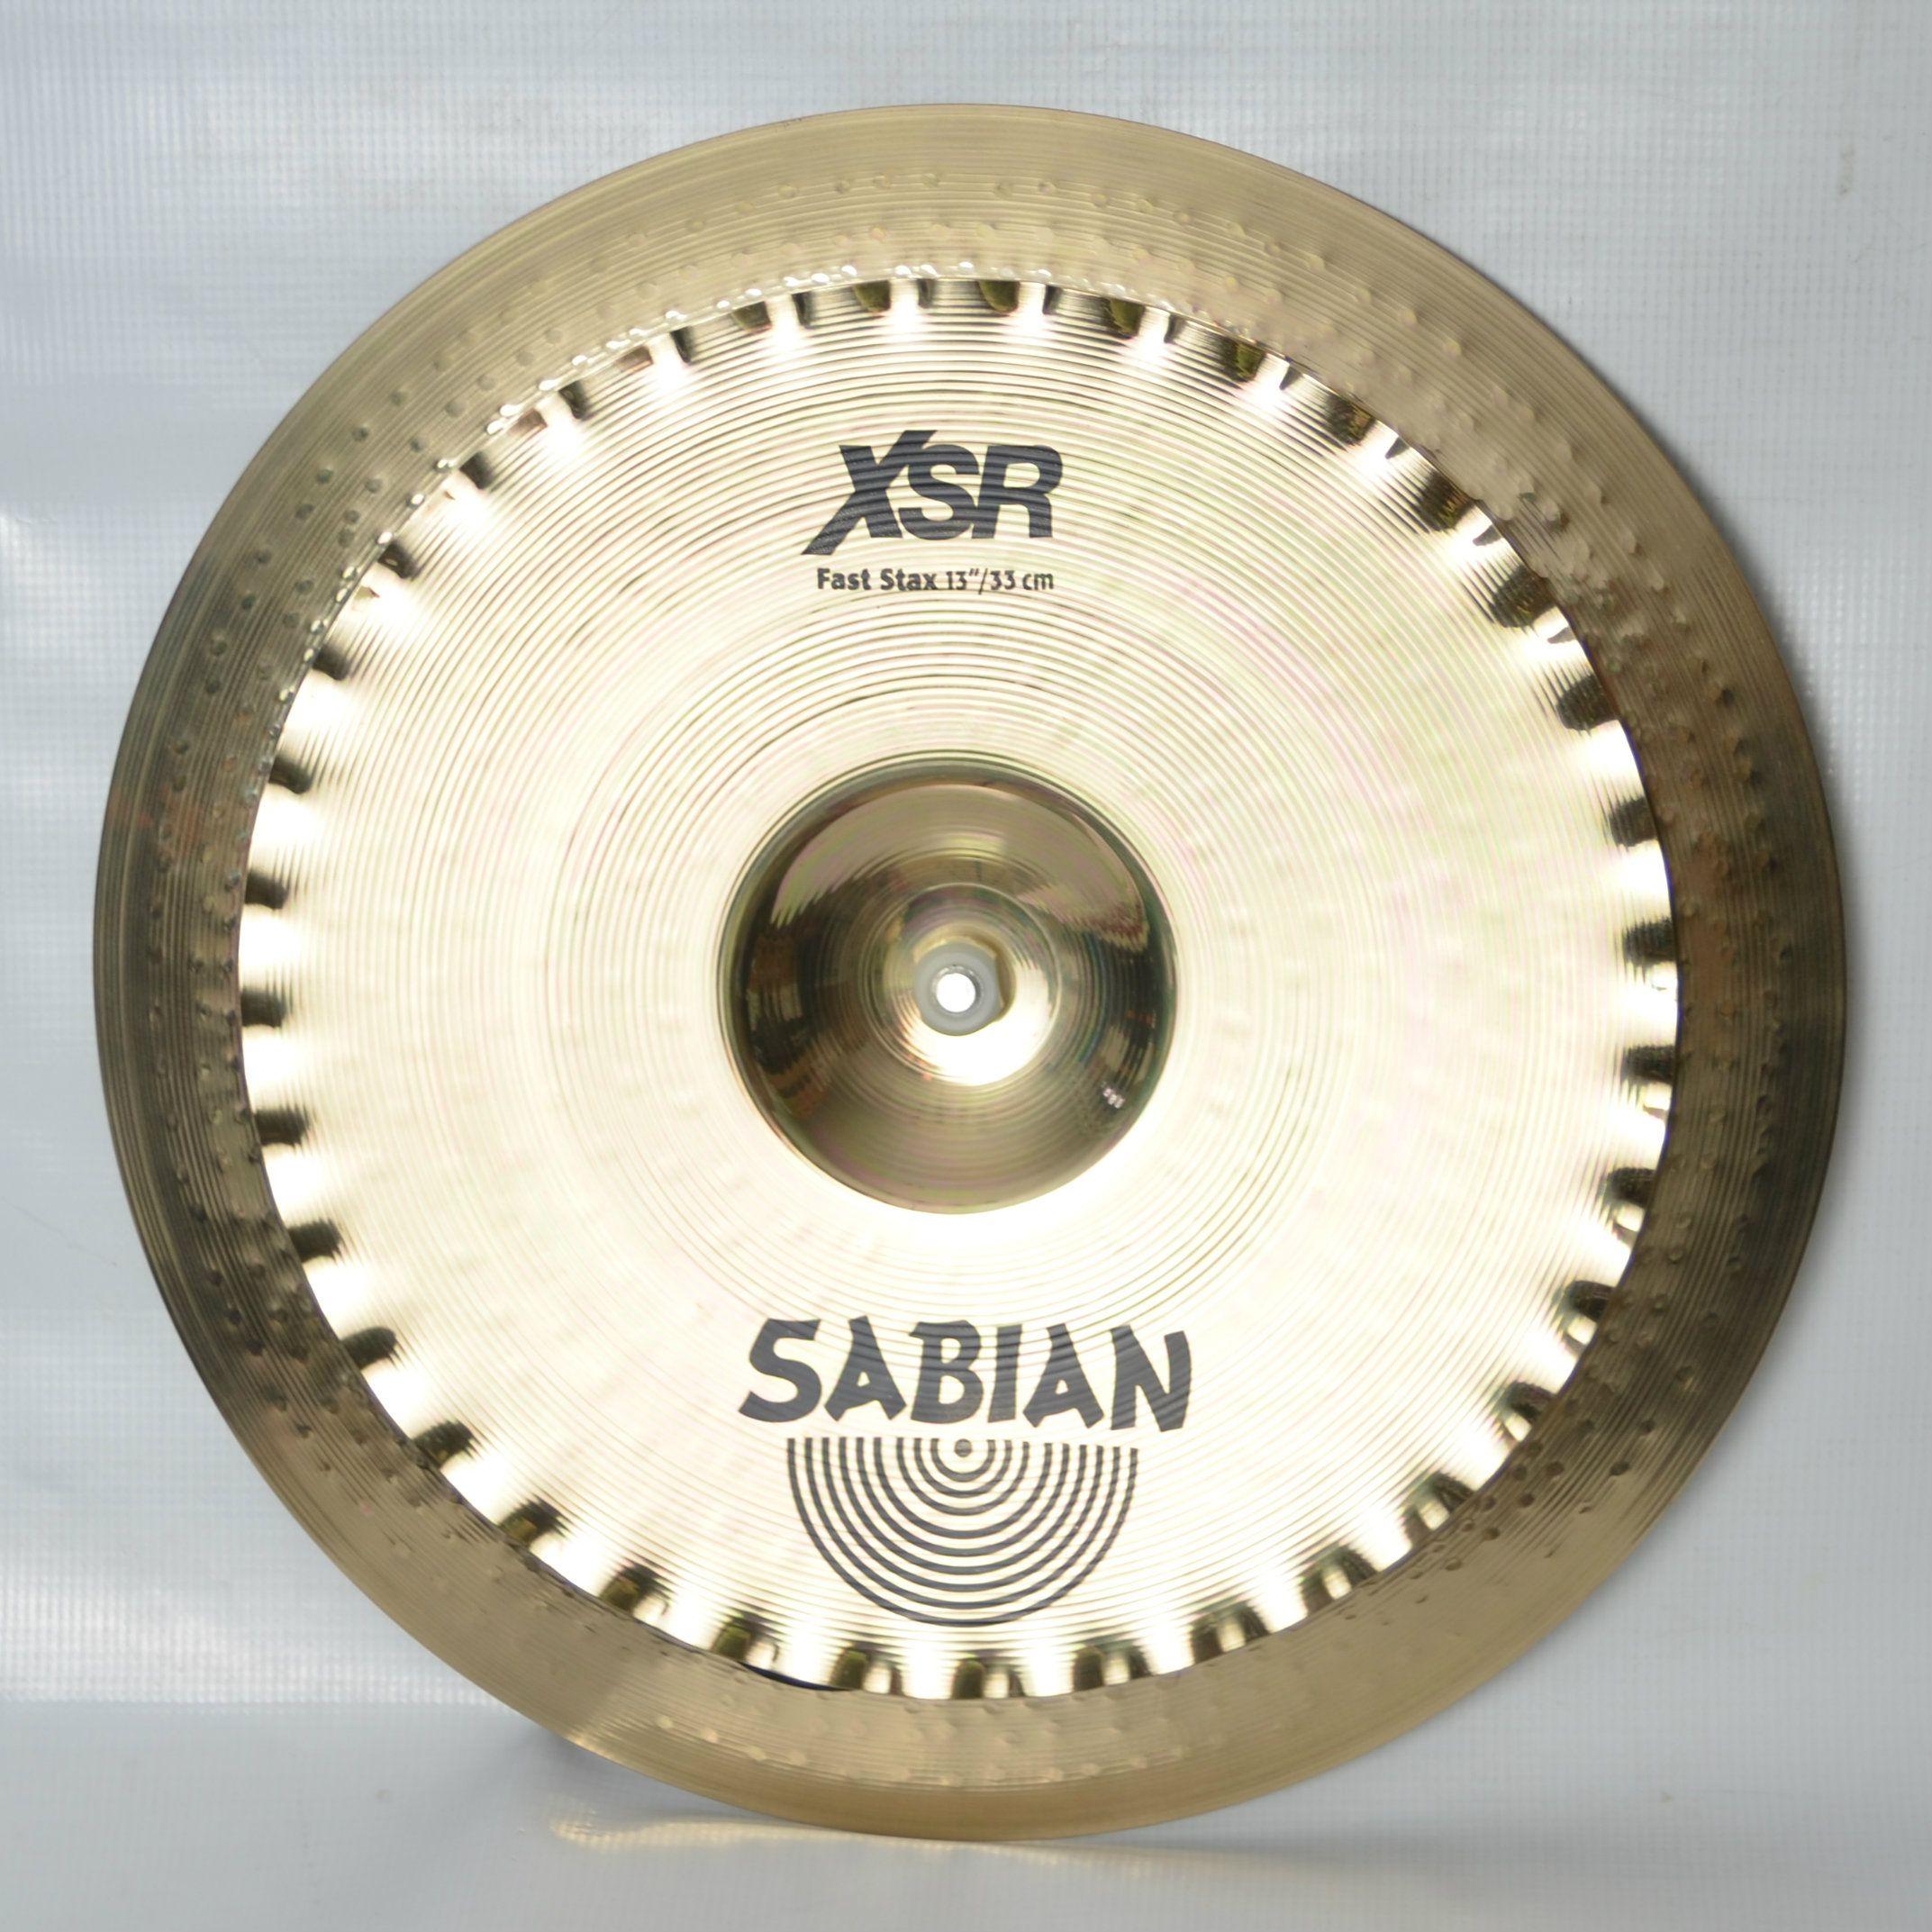 Sabian Stax